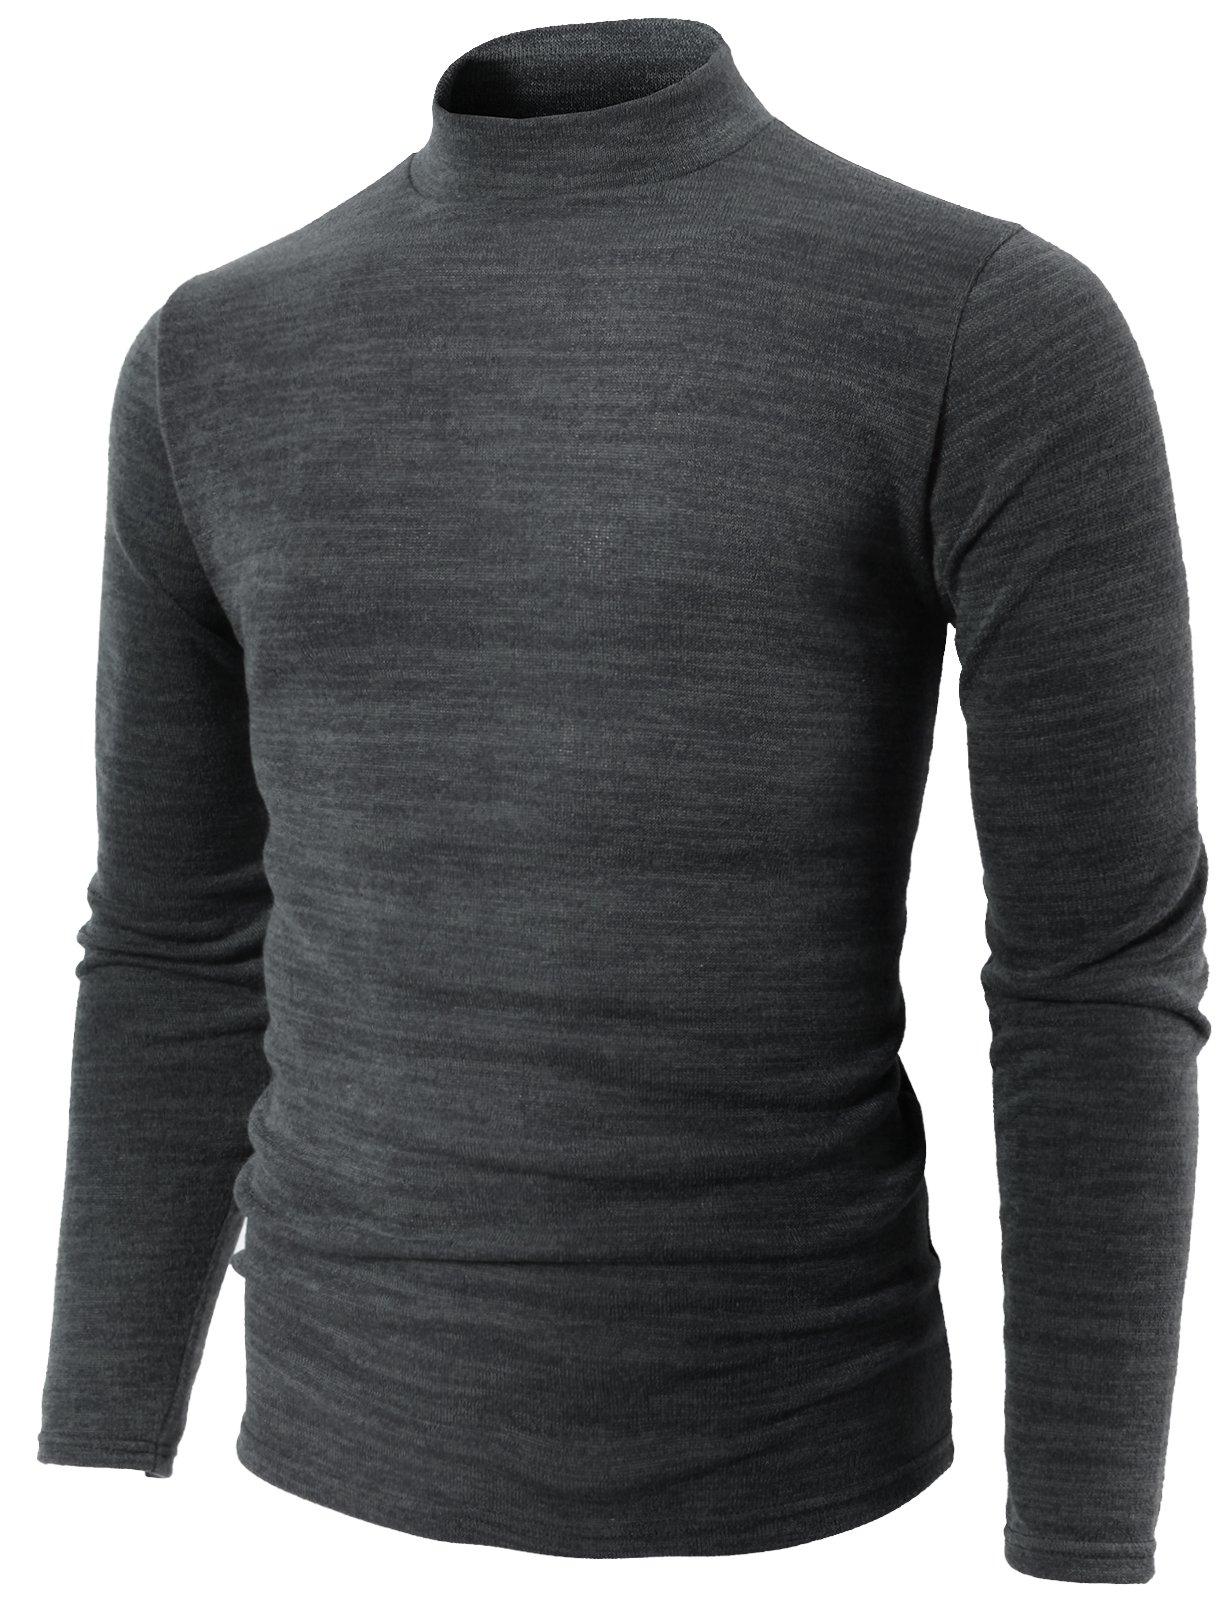 H2H Mens Casual Slim Fit Half Turtle-Neck Lightweight Sweater Gray US M/Asia XL (KMTTL0412)